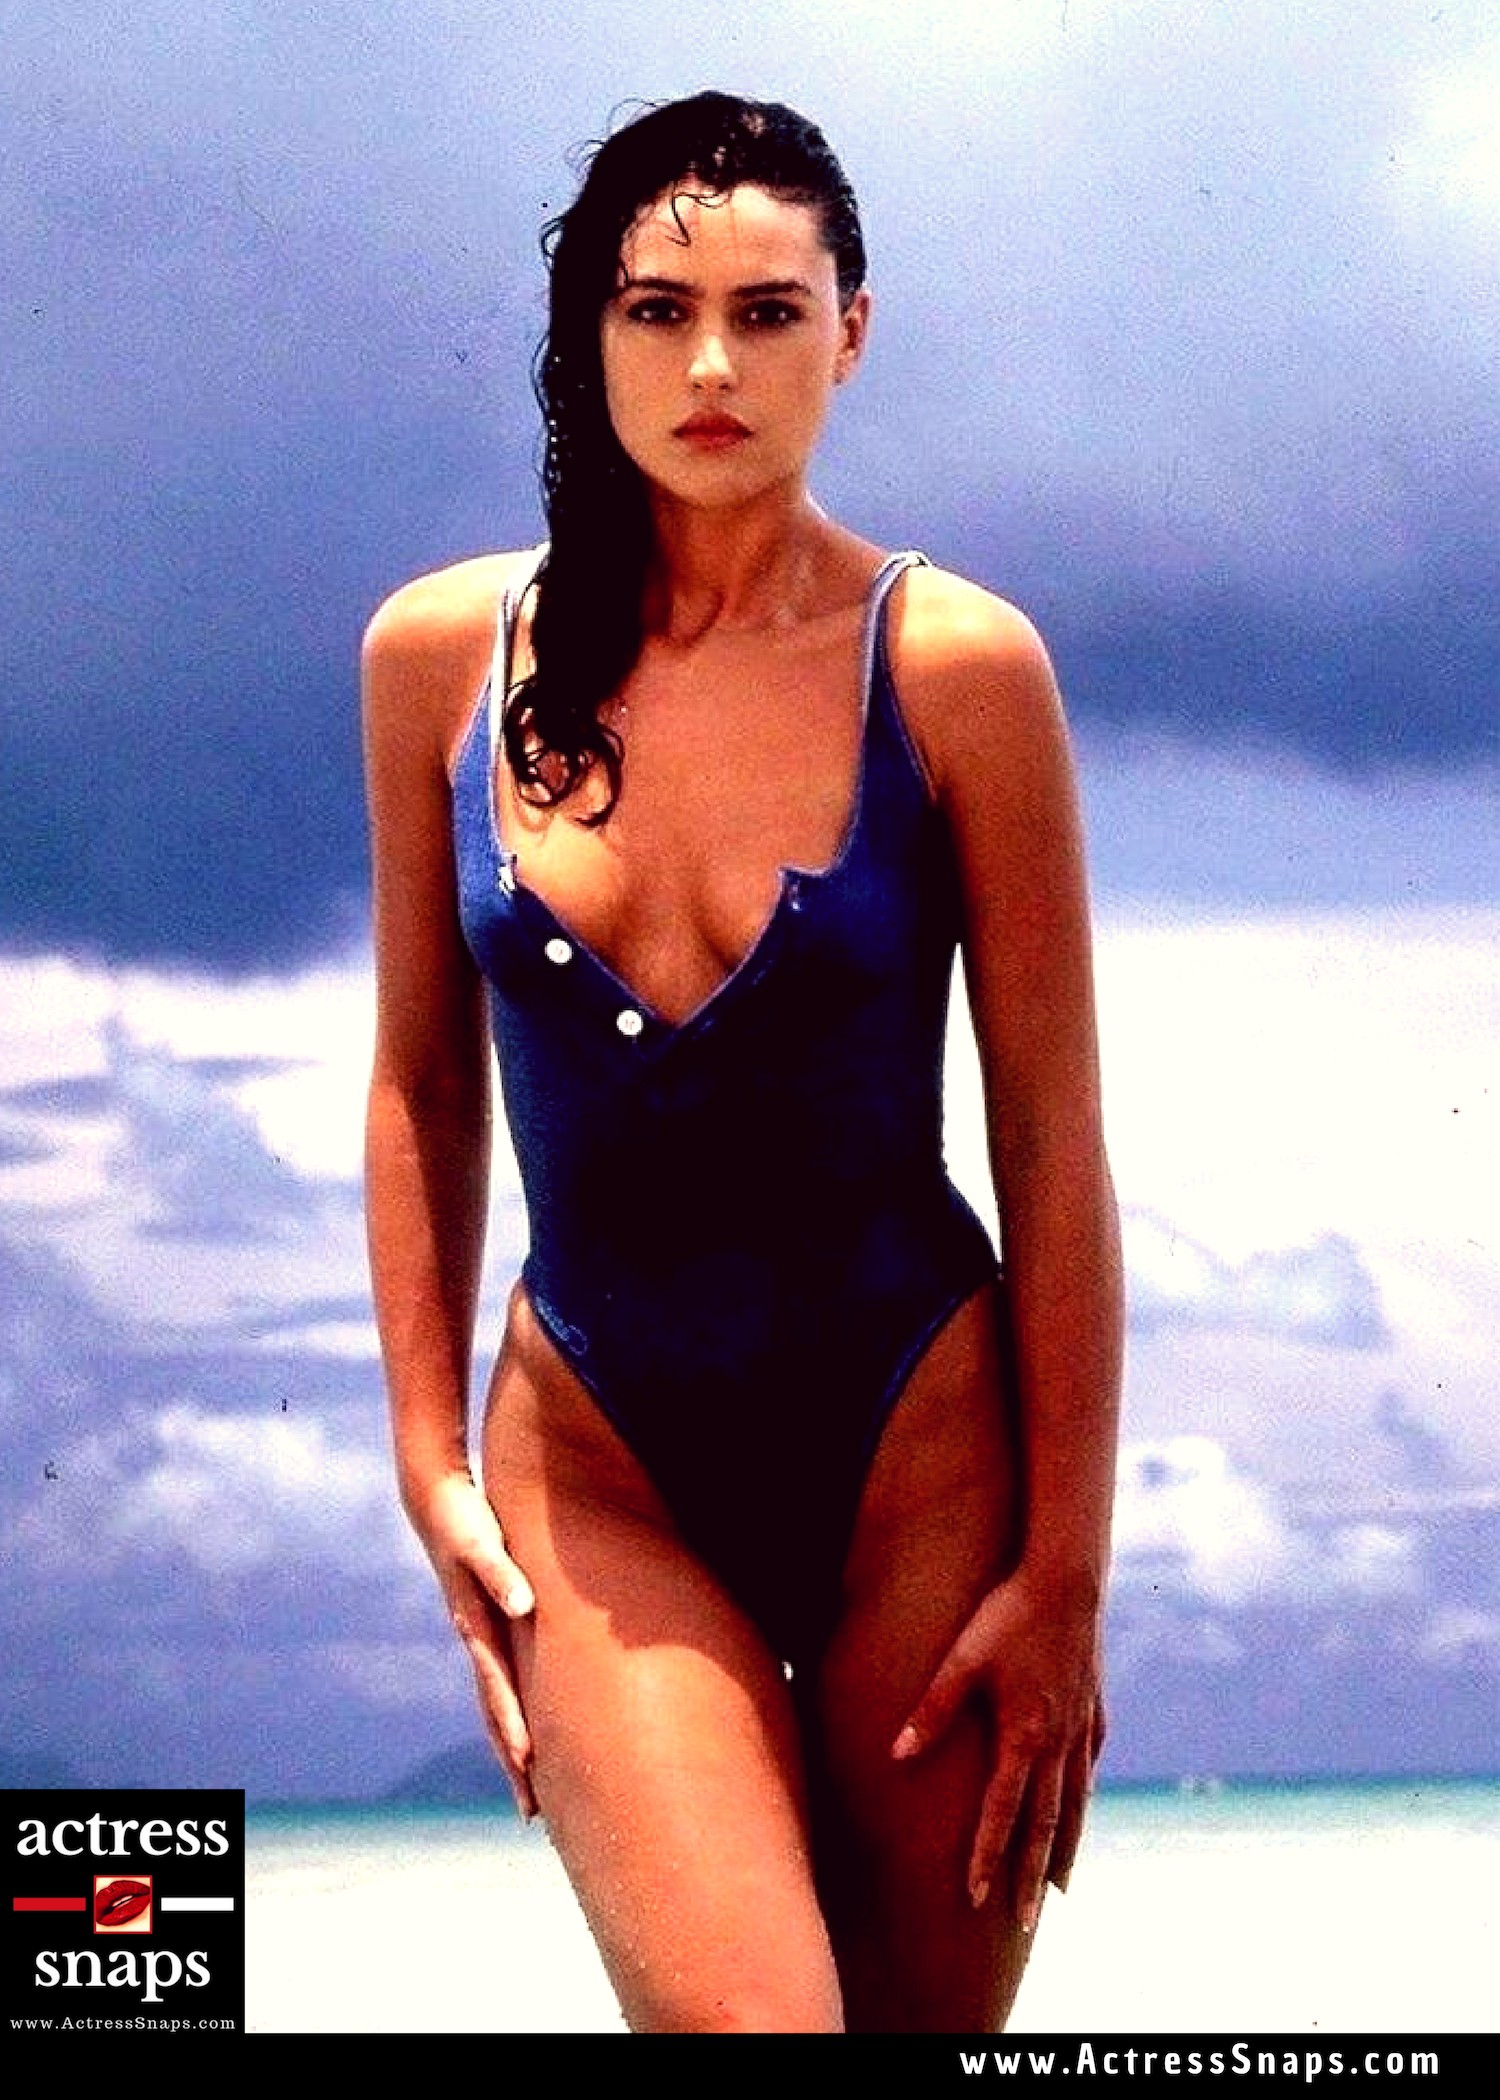 Sexy Monica Belluci Bikini Photos - Sexy Actress Pictures | Hot Actress Pictures - ActressSnaps.com